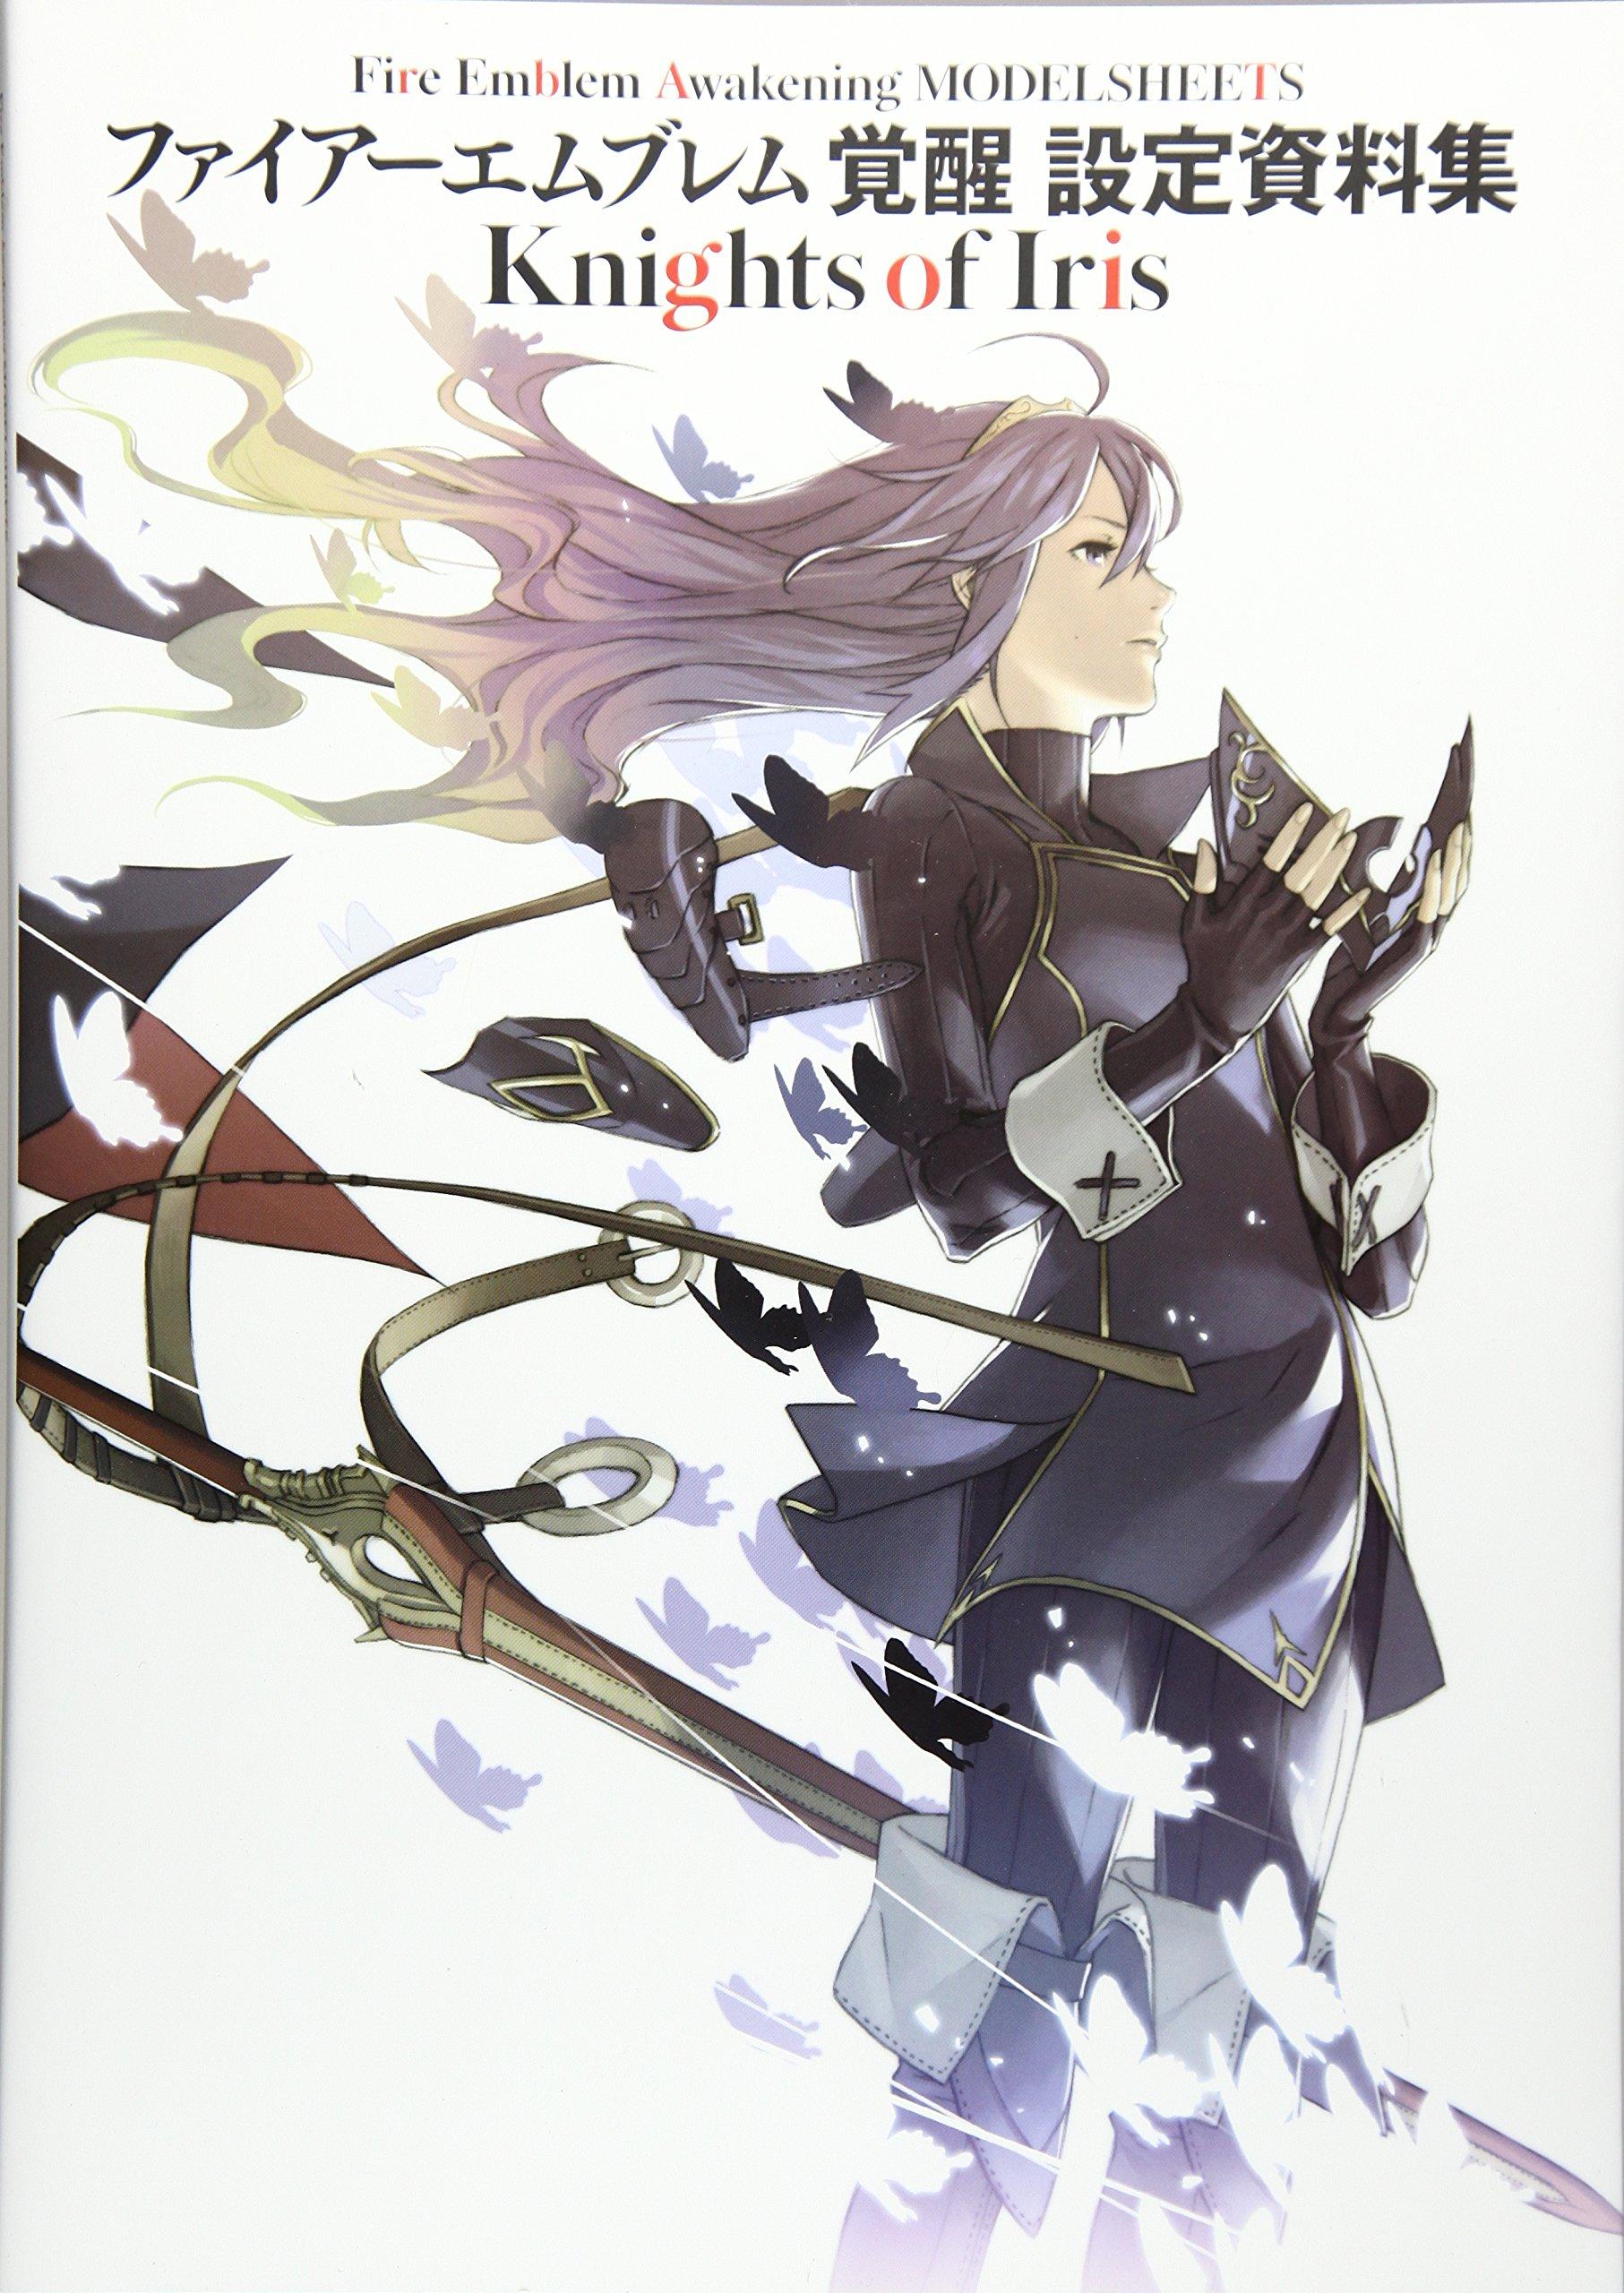 Fire Emblem Awakening Kakusei Model Sheets Knights of Iris